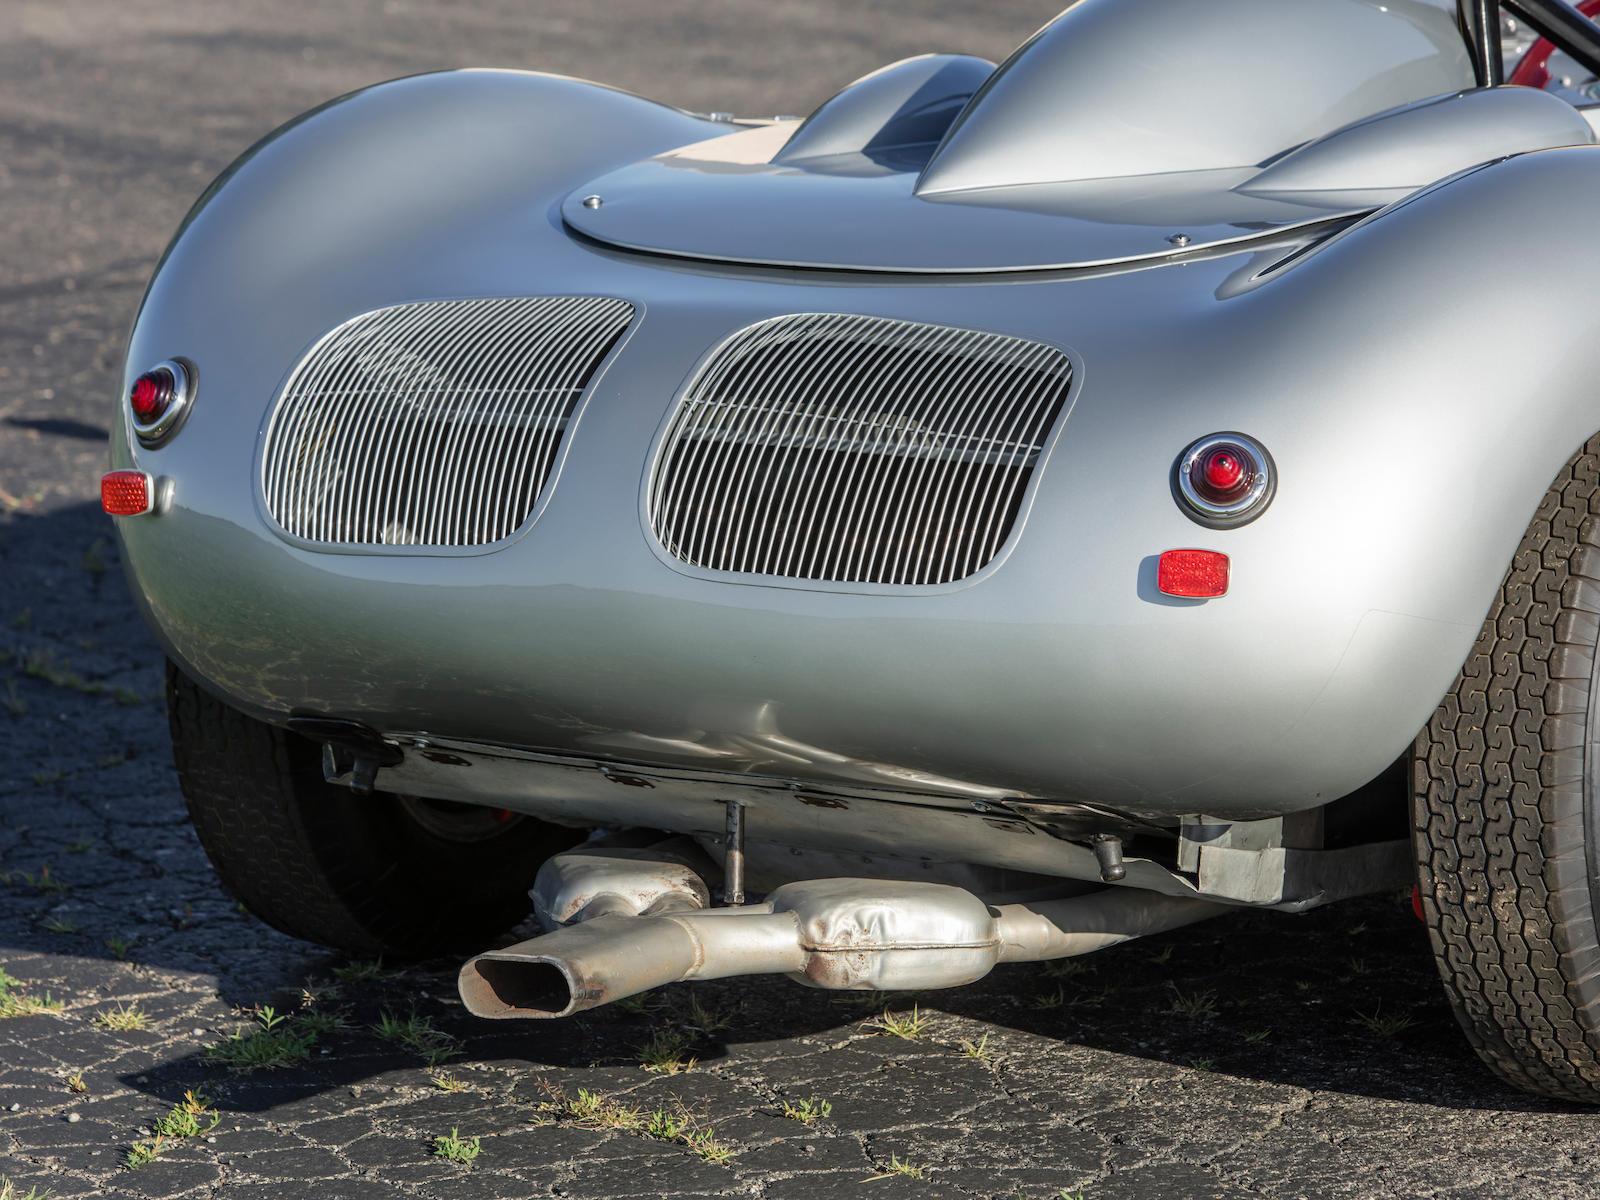 1959 Porsche 718 RSK exhaust